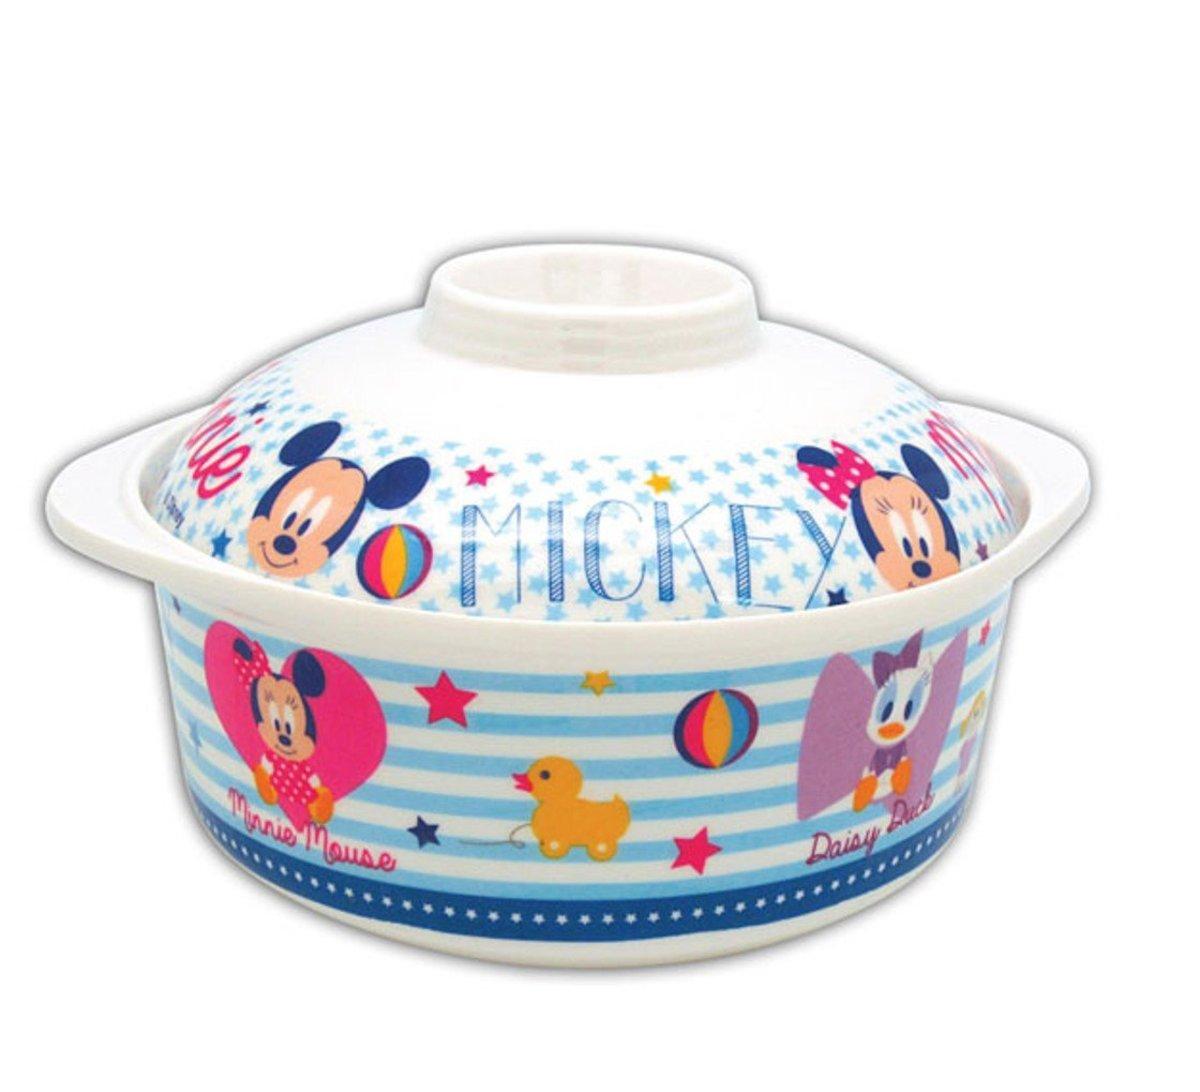 5.5 soup bowl w/lid(Licensed by Disney)